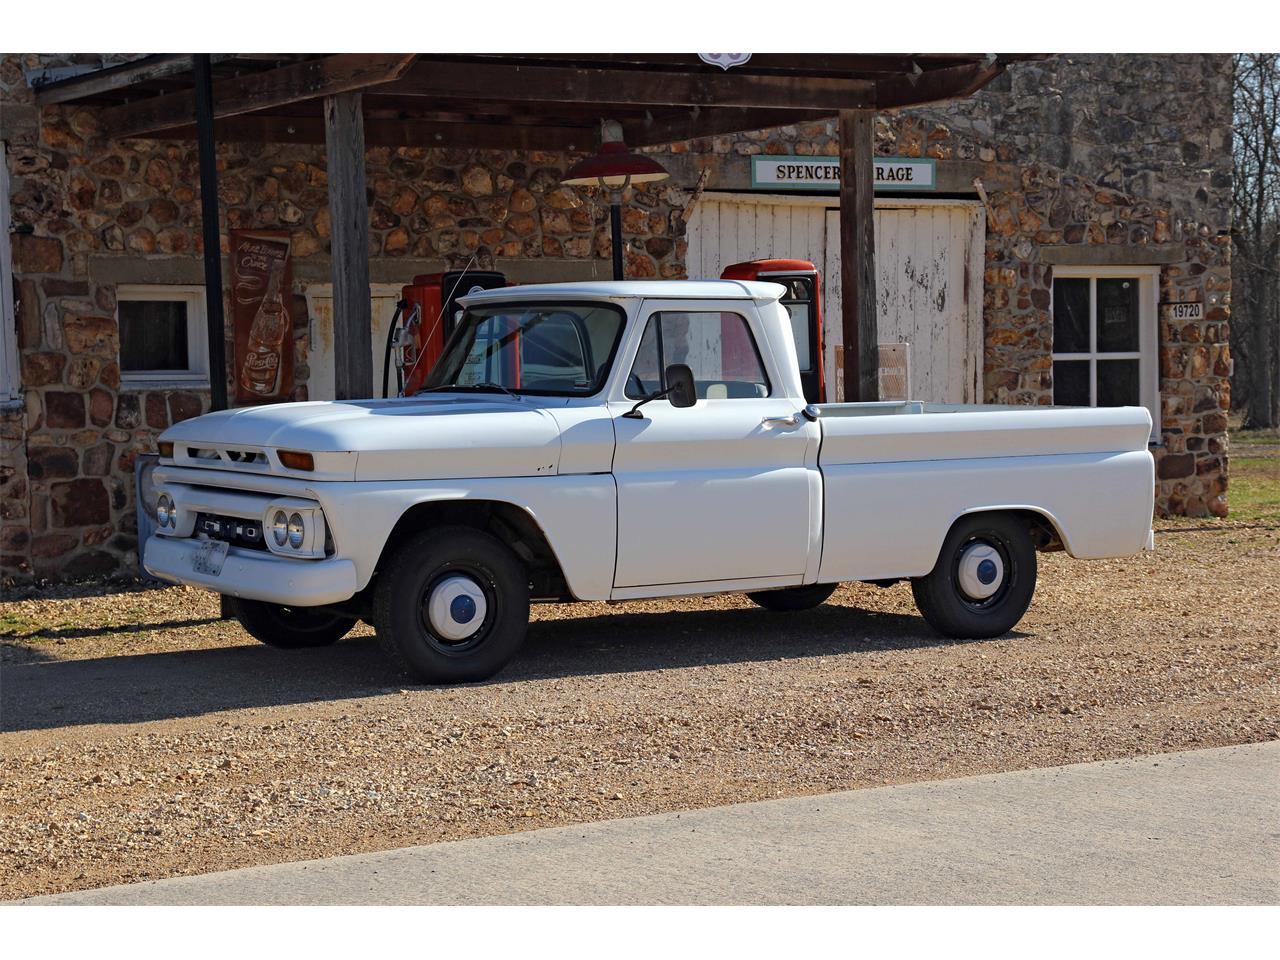 1966 Gmc Truck For Sale Classiccars Com Cc 1202813